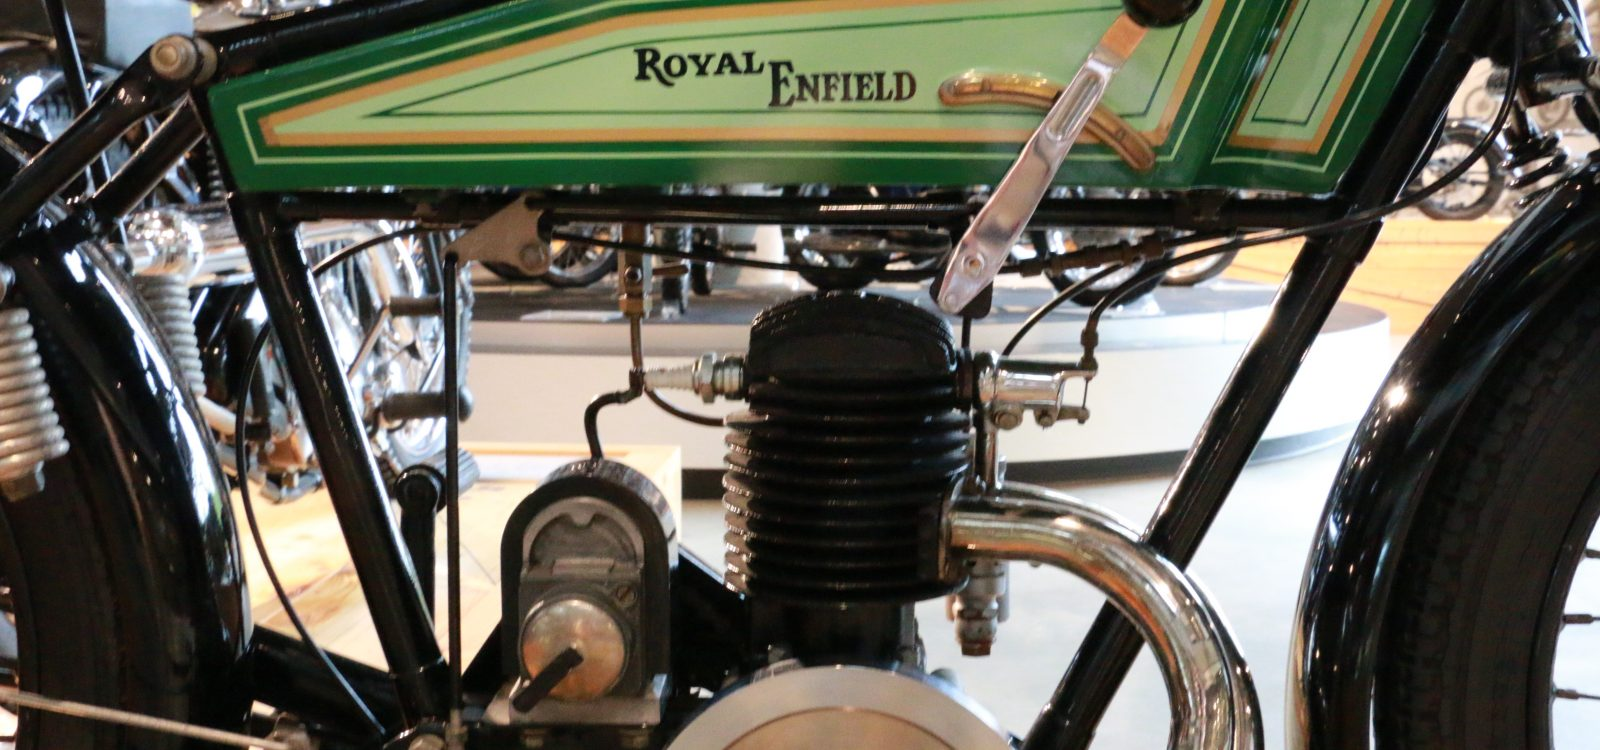 1926 Royal Enfield 200 Sport